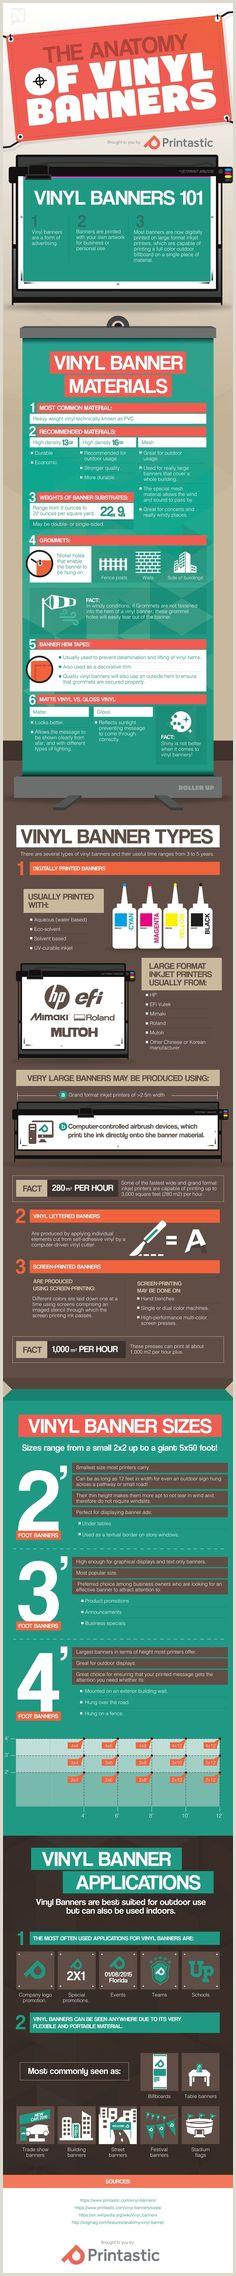 Vista Print Vinyl Banner Design Custom Vinyl And Mesh Banners Line